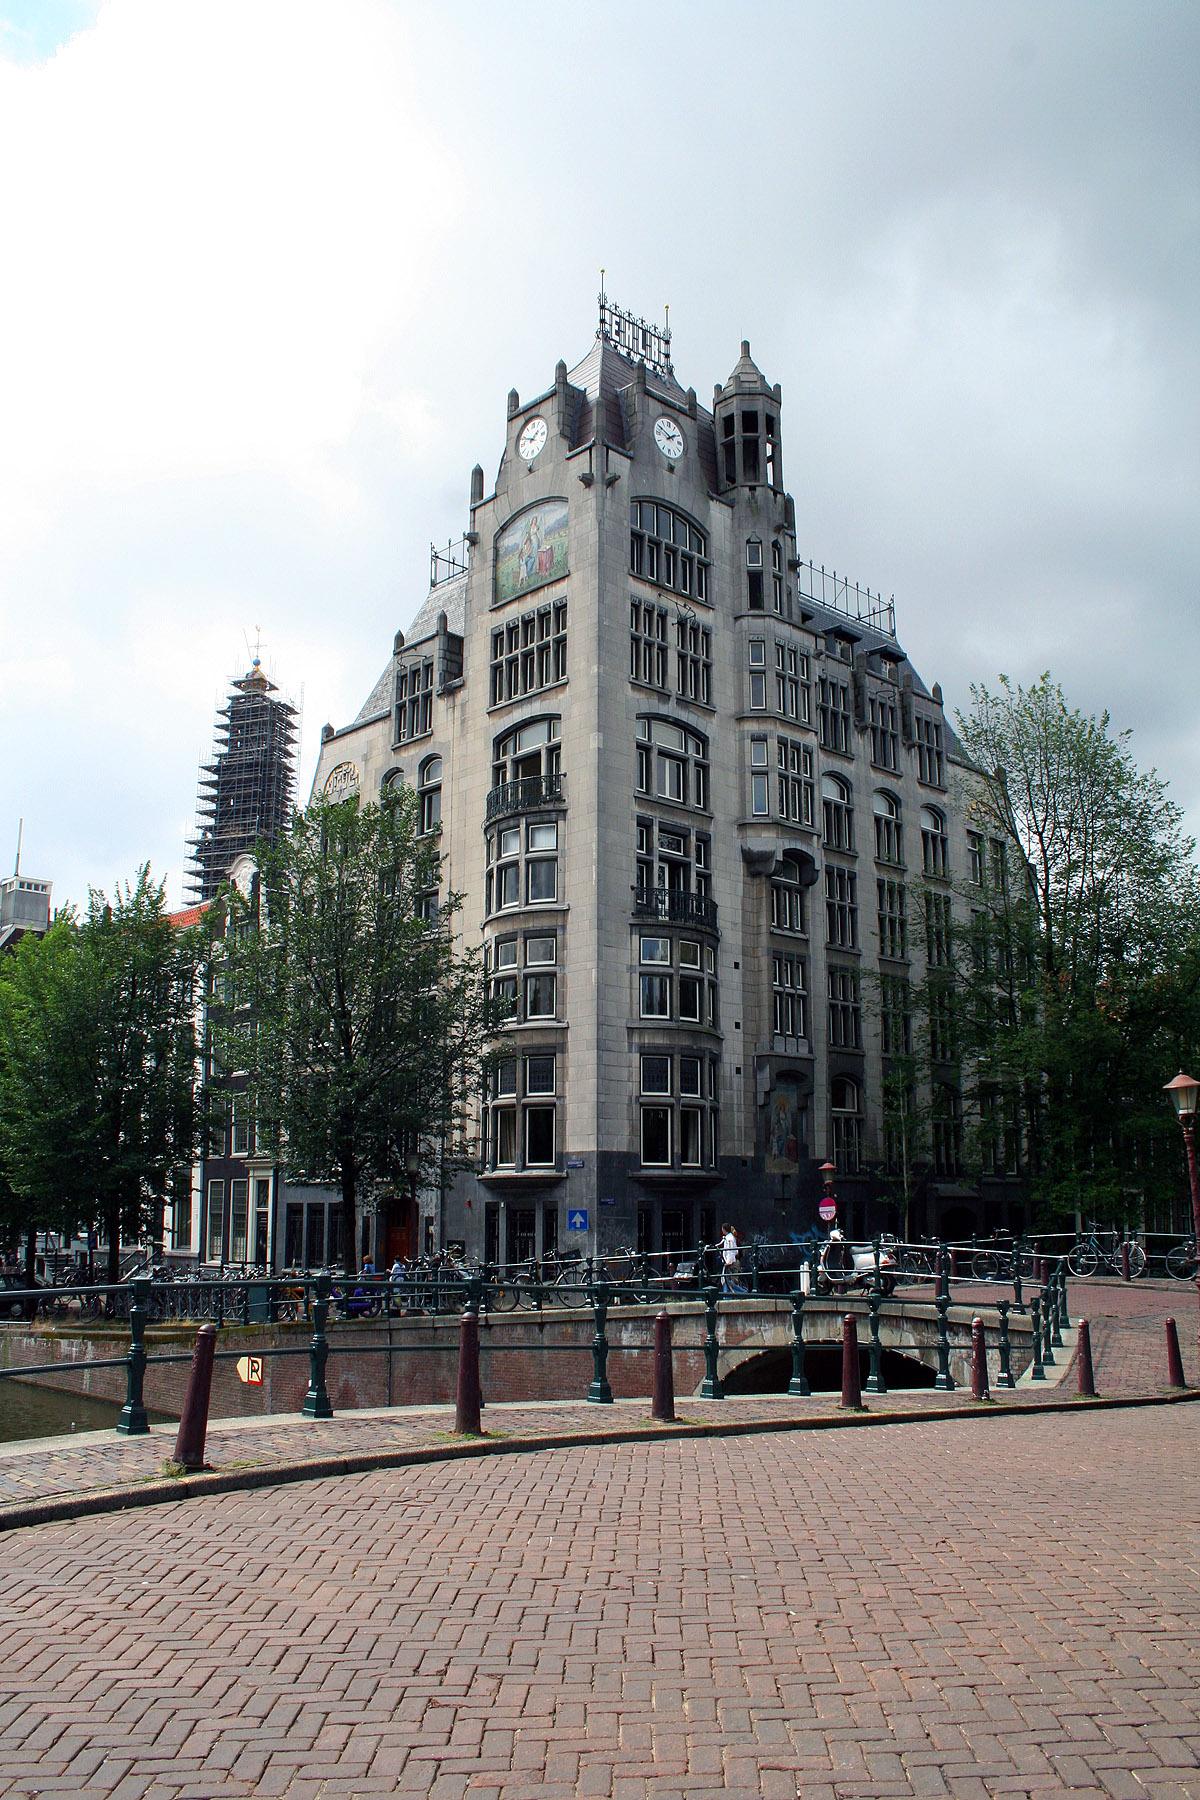 Amsterdam, Old, Static, Classic, City, HQ Photo